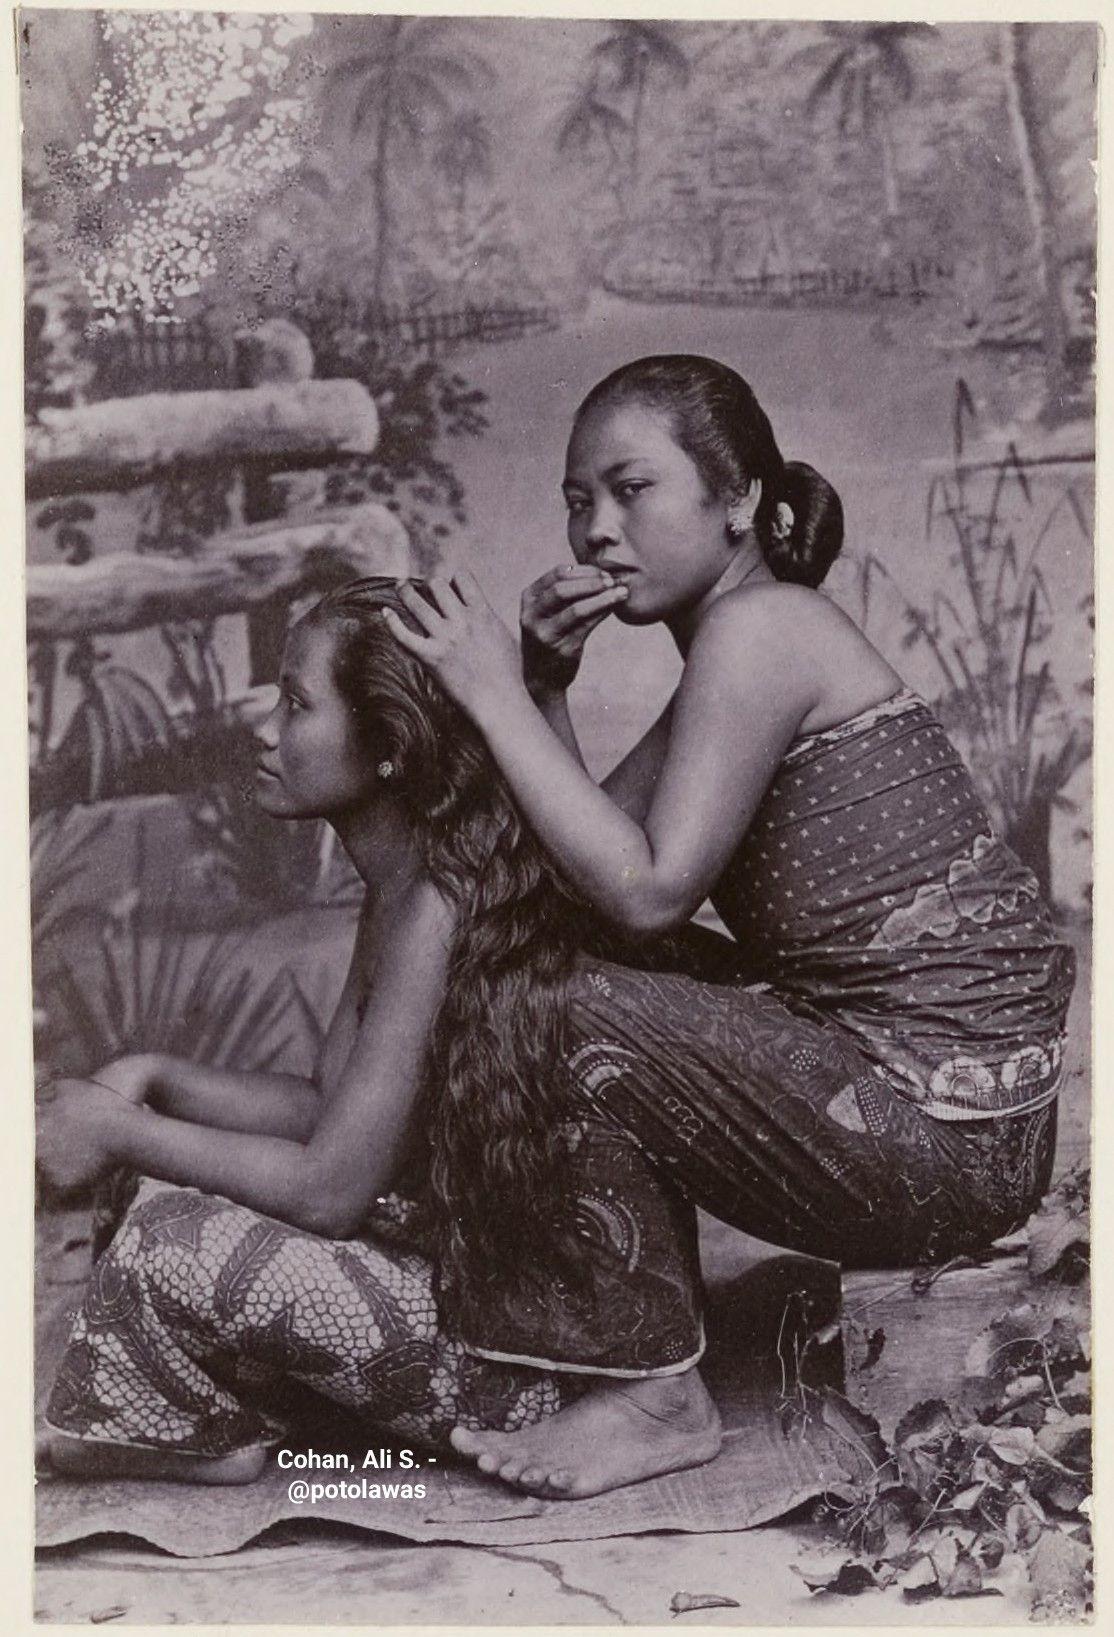 Potret dua orang wanita Jawa, ca. 1890. Kalo ditempat